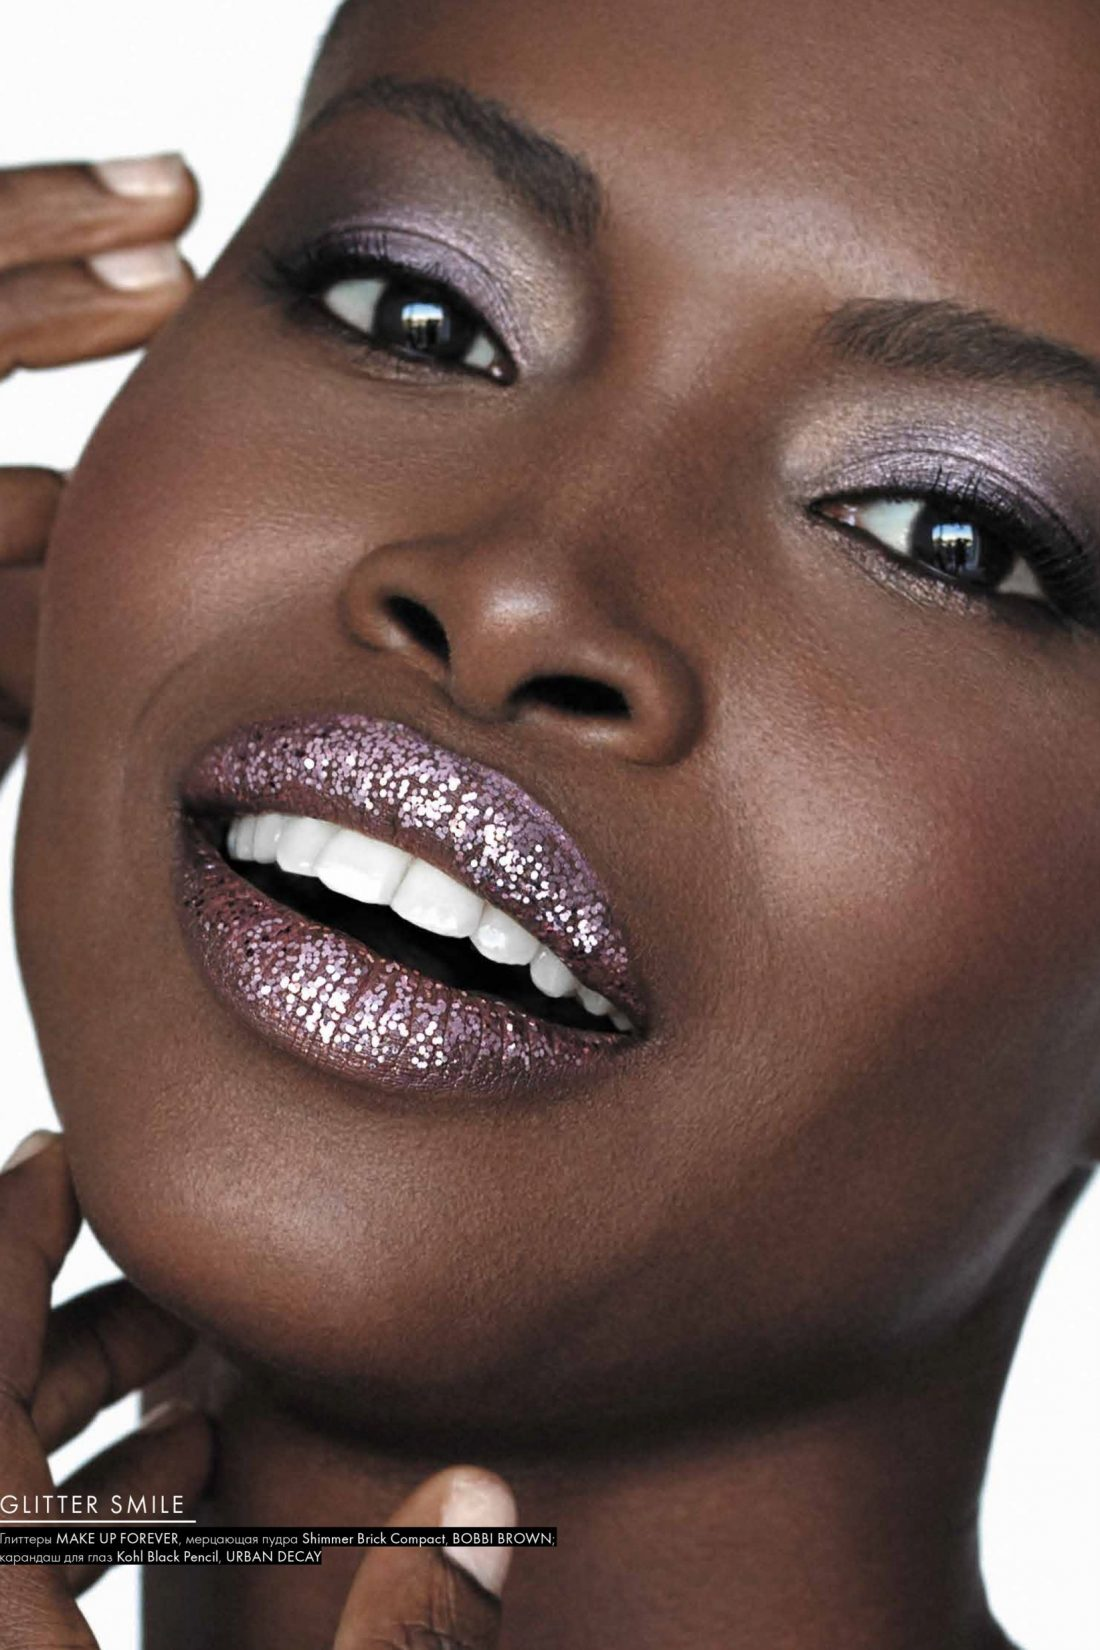 Nargis Magazine - Shades of chocolate | Tania Cozma makeup